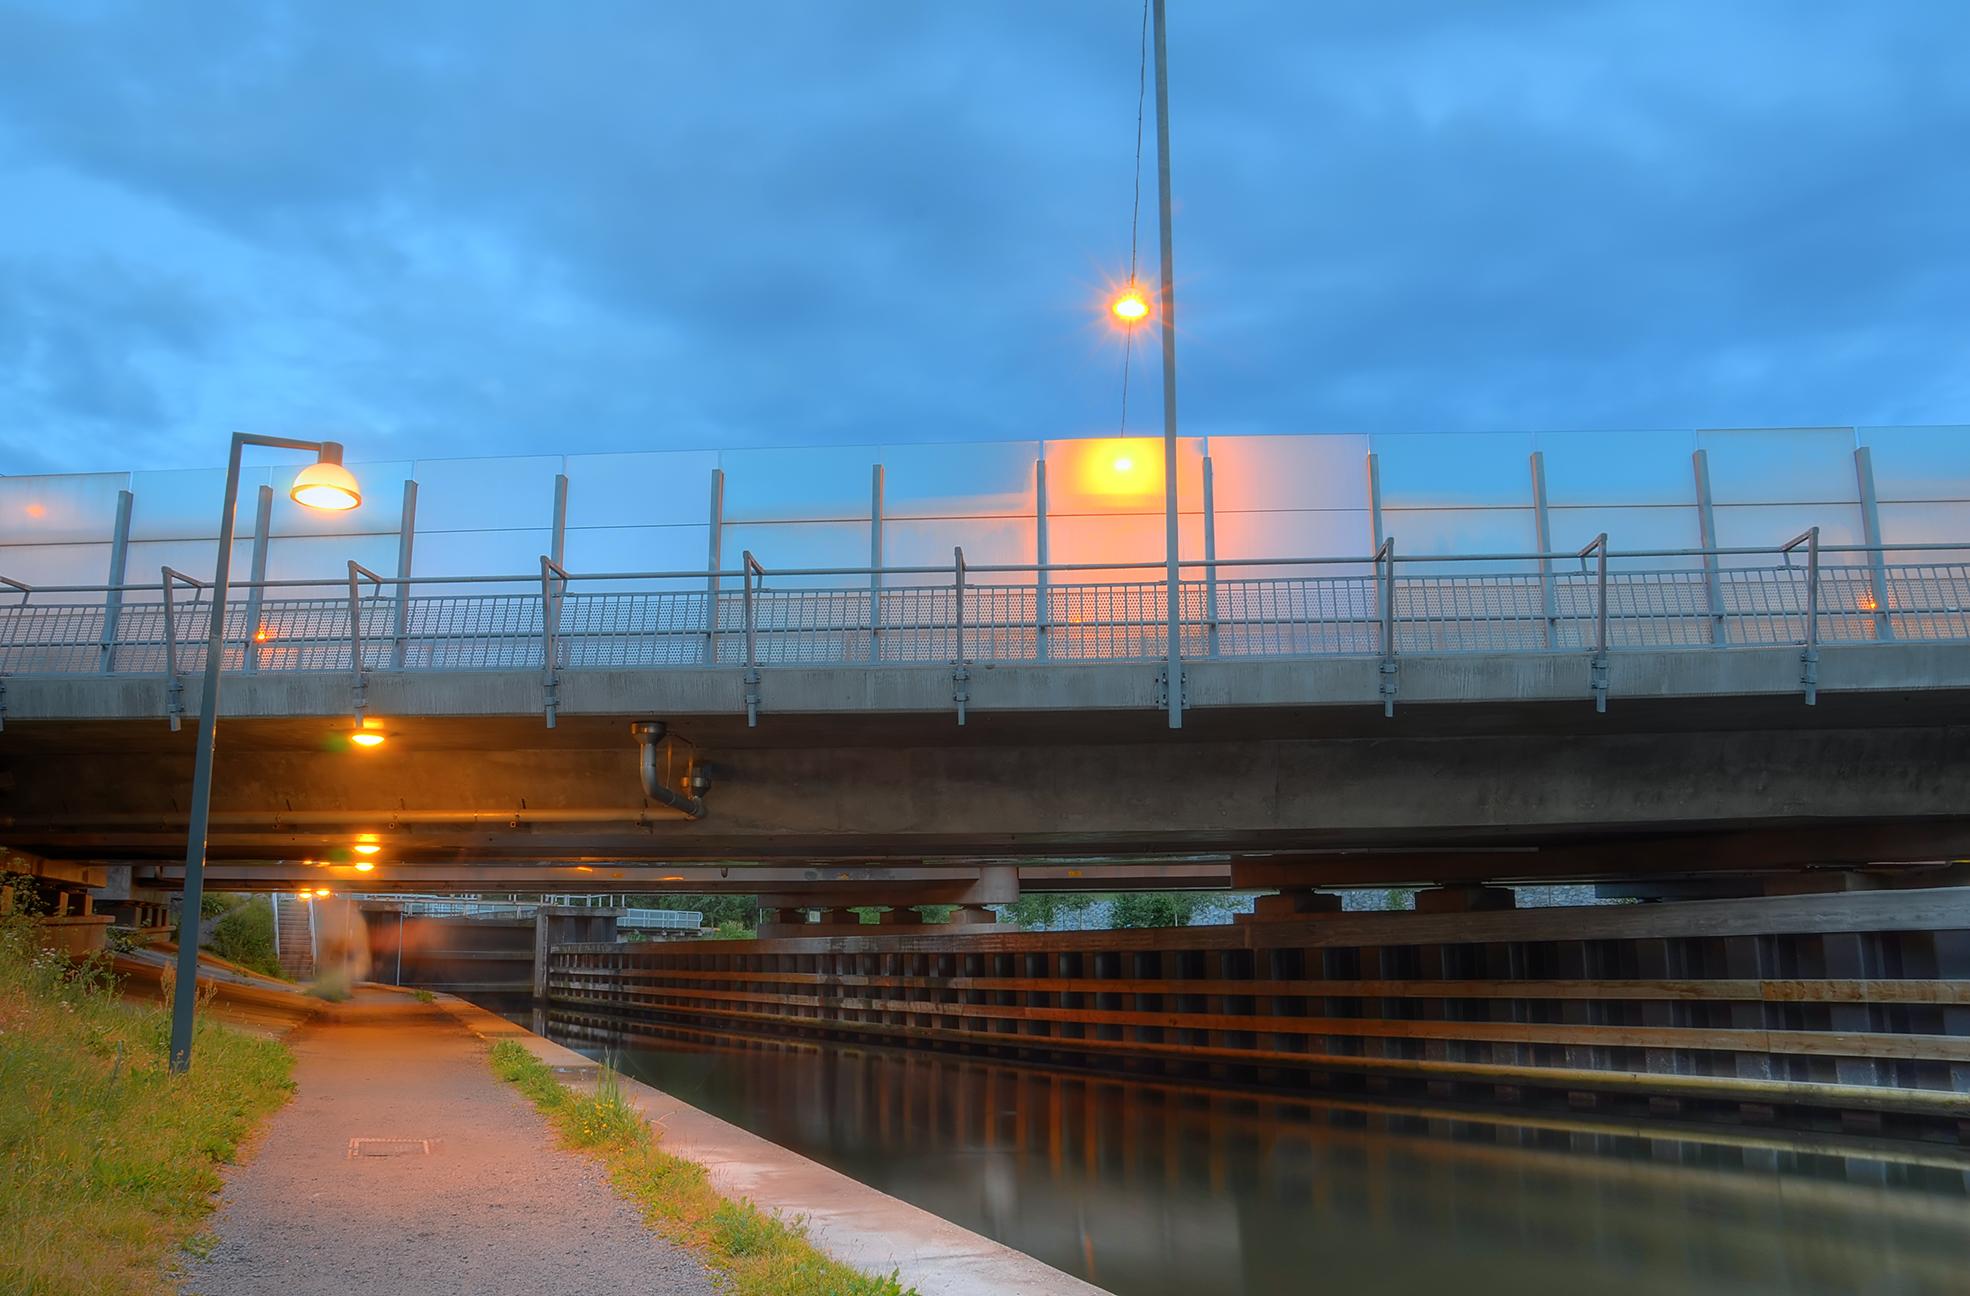 The Sickla Lock II by HenrikSundholm